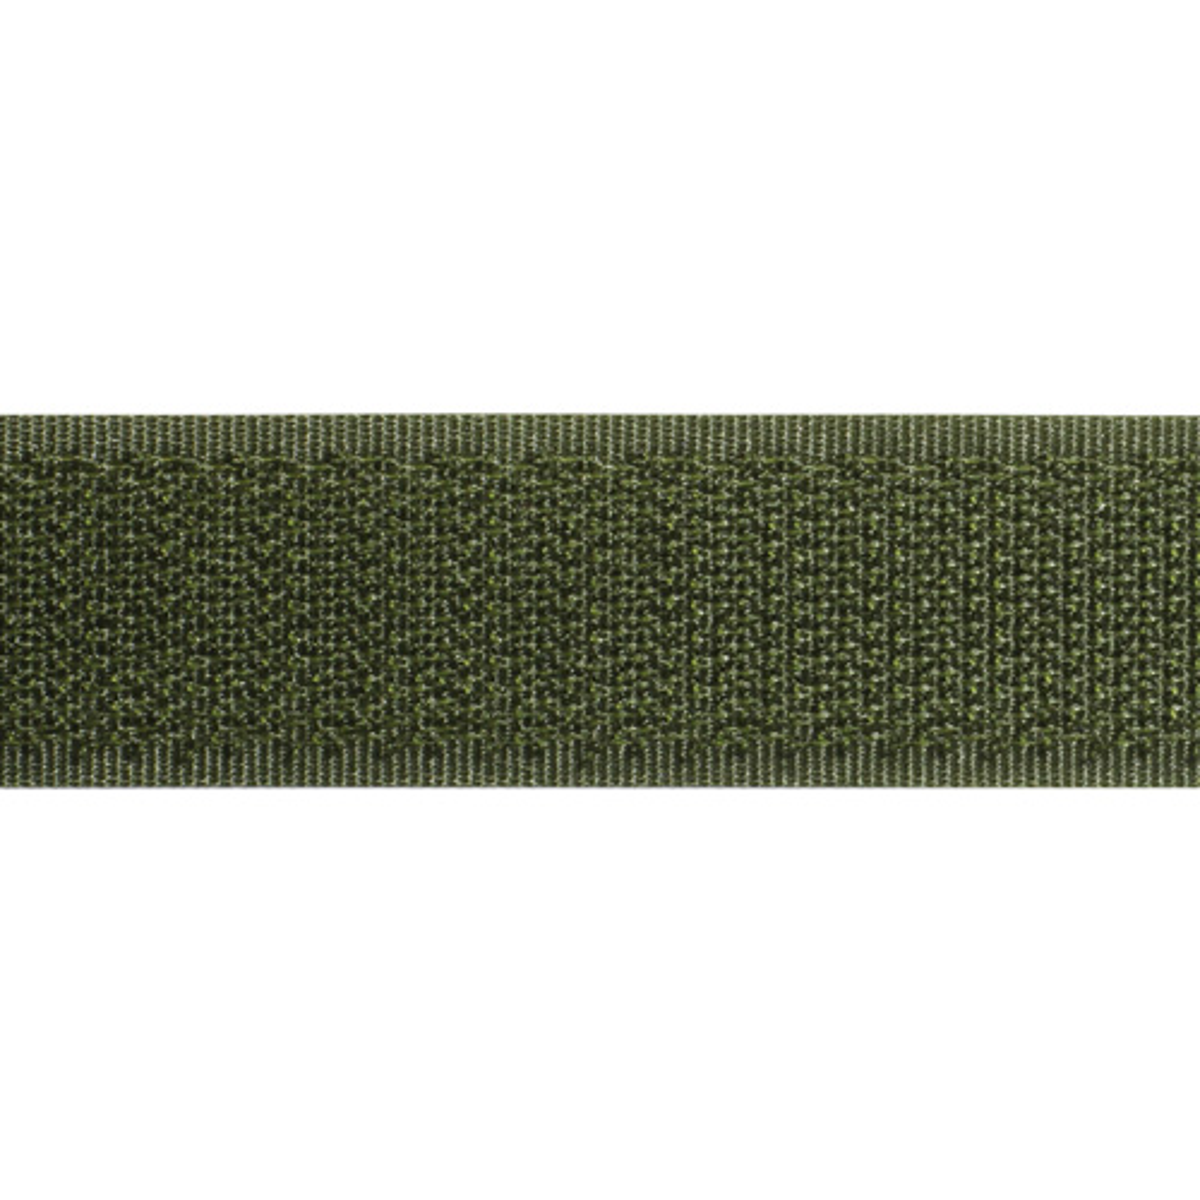 20010 Лента контактная 20мм. 25м 'крючок' (12 хаки) ГР